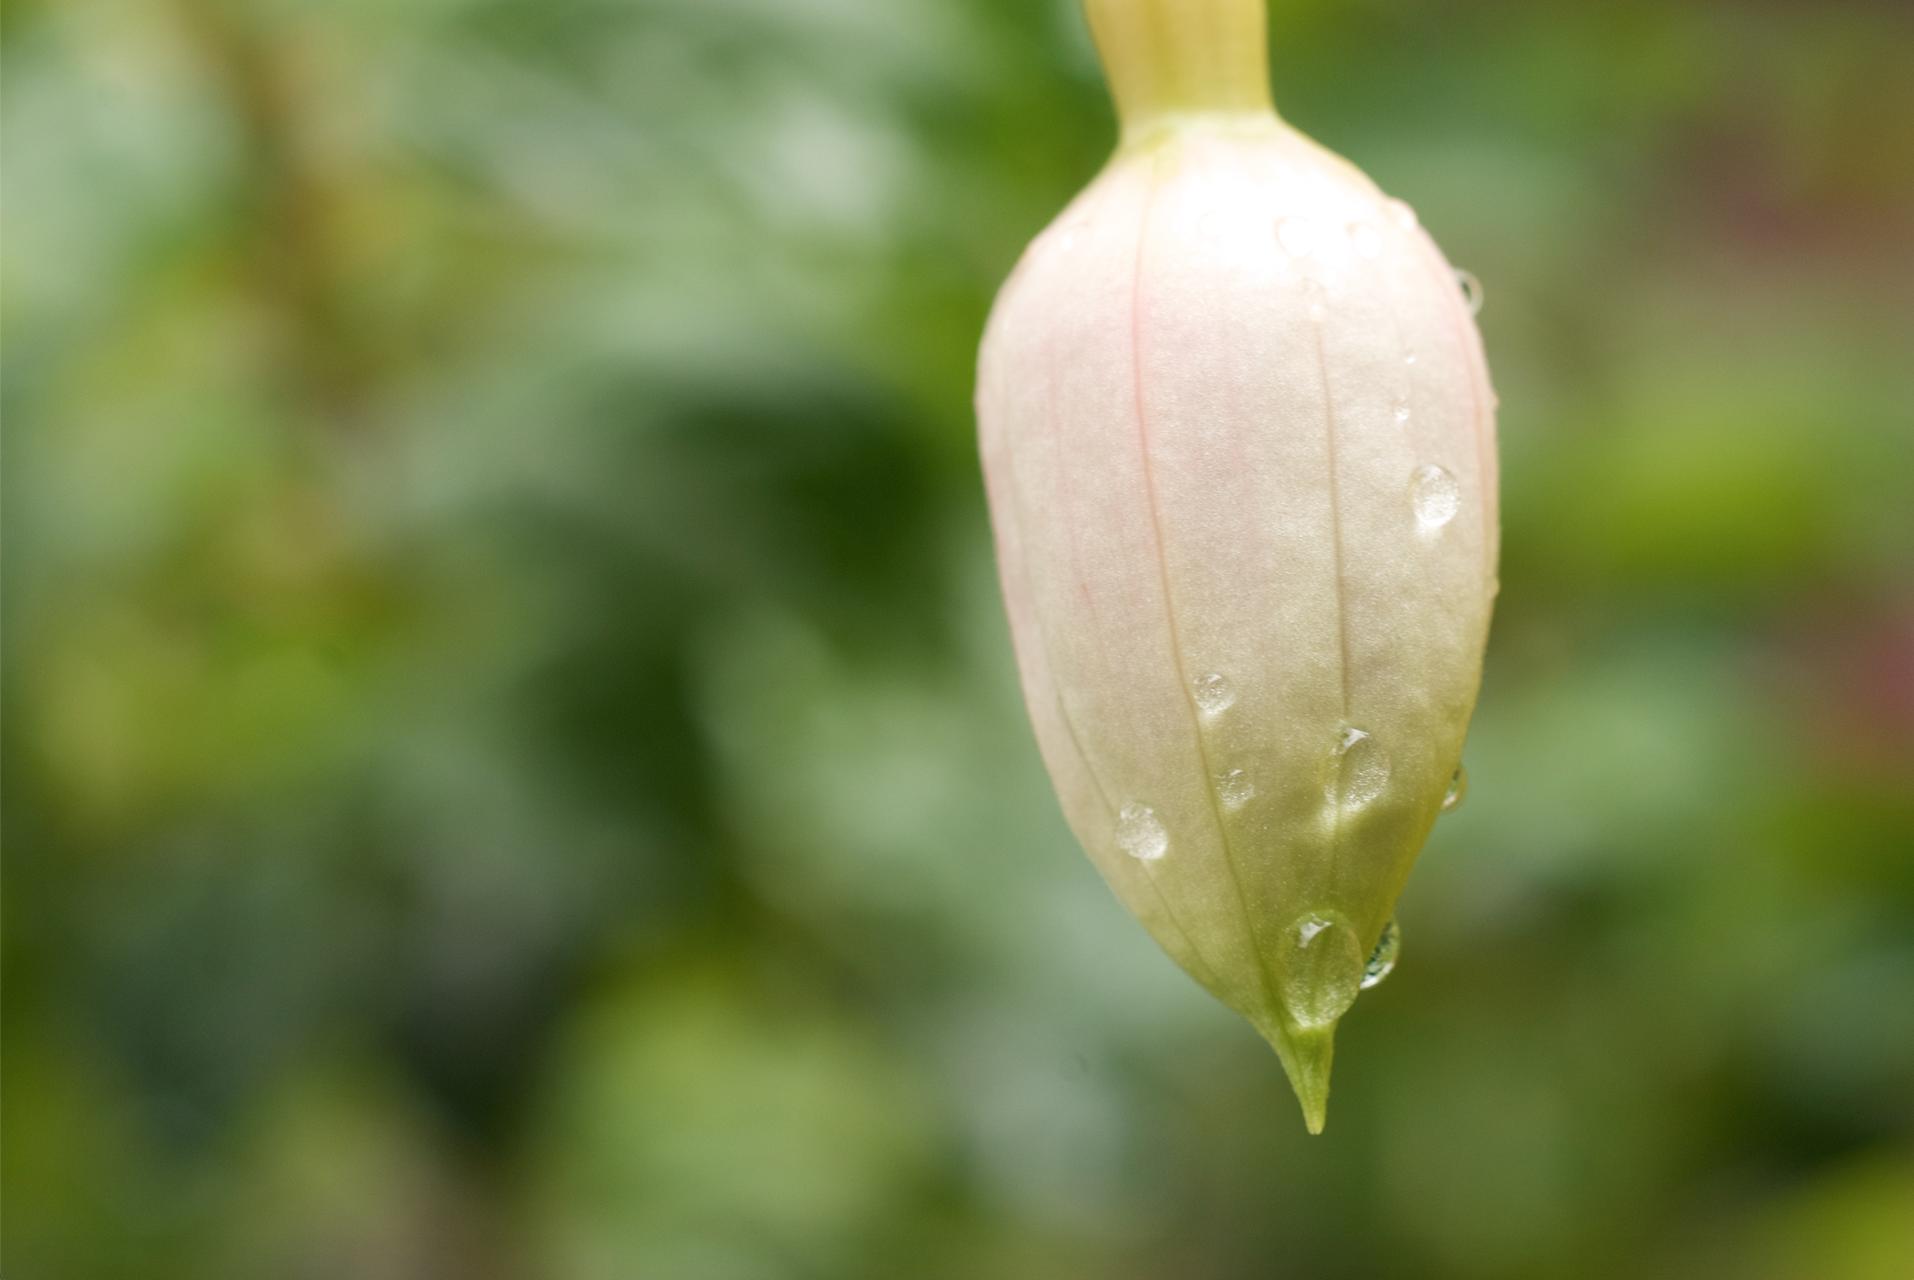 dew on flower bud.jpg